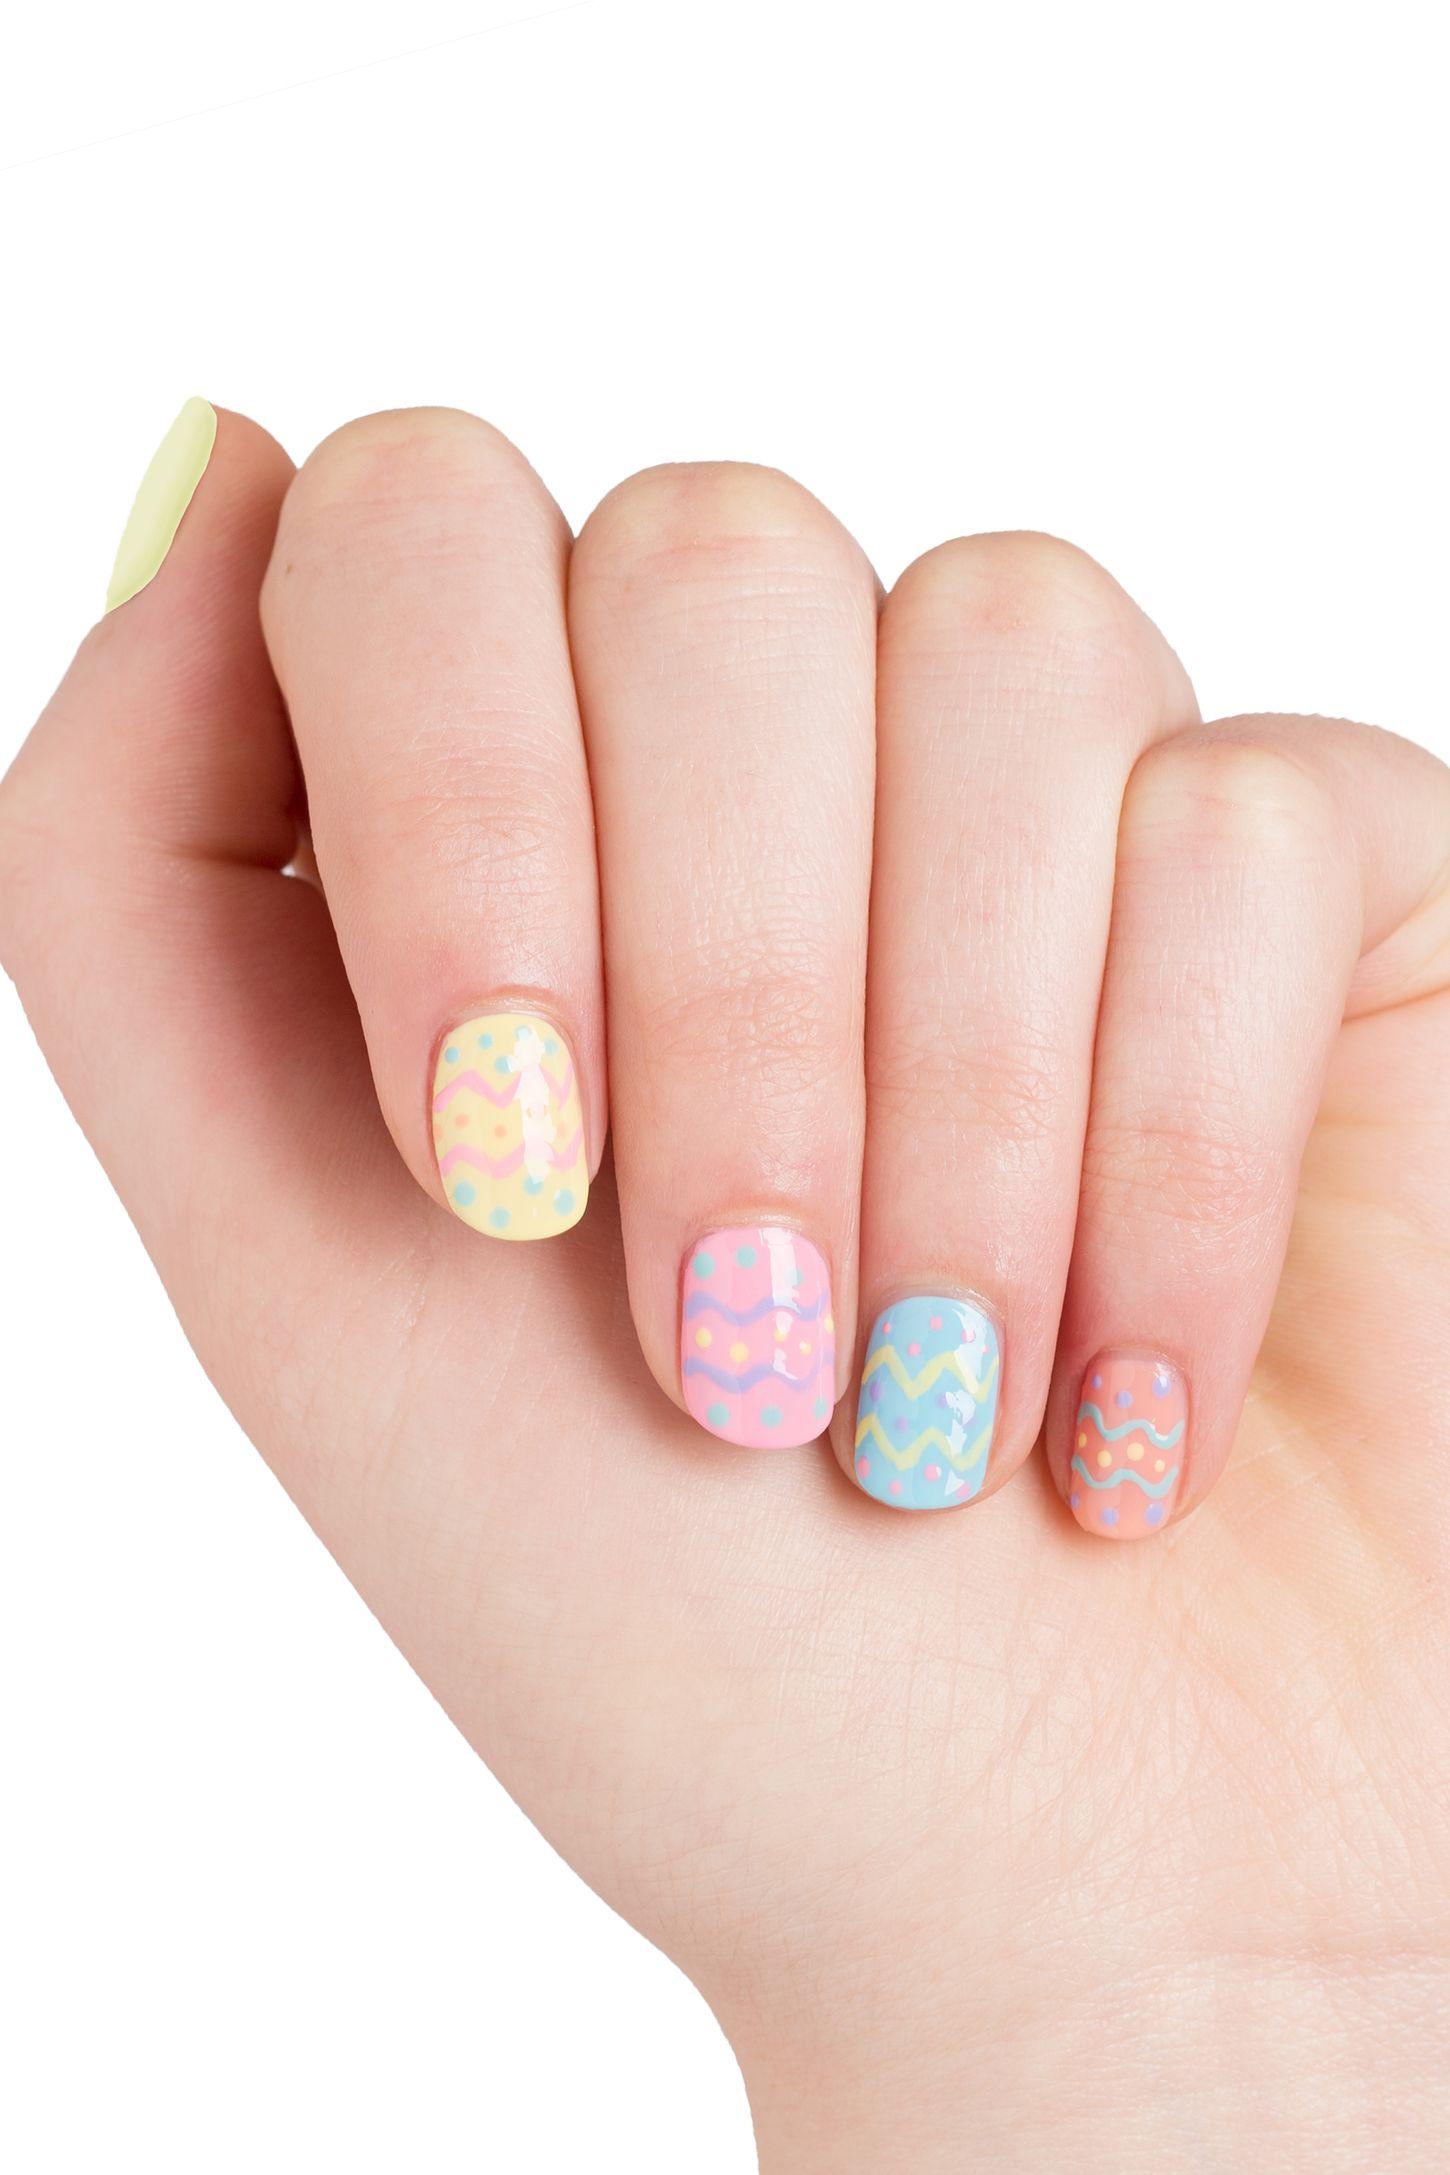 spring pastel easter nails